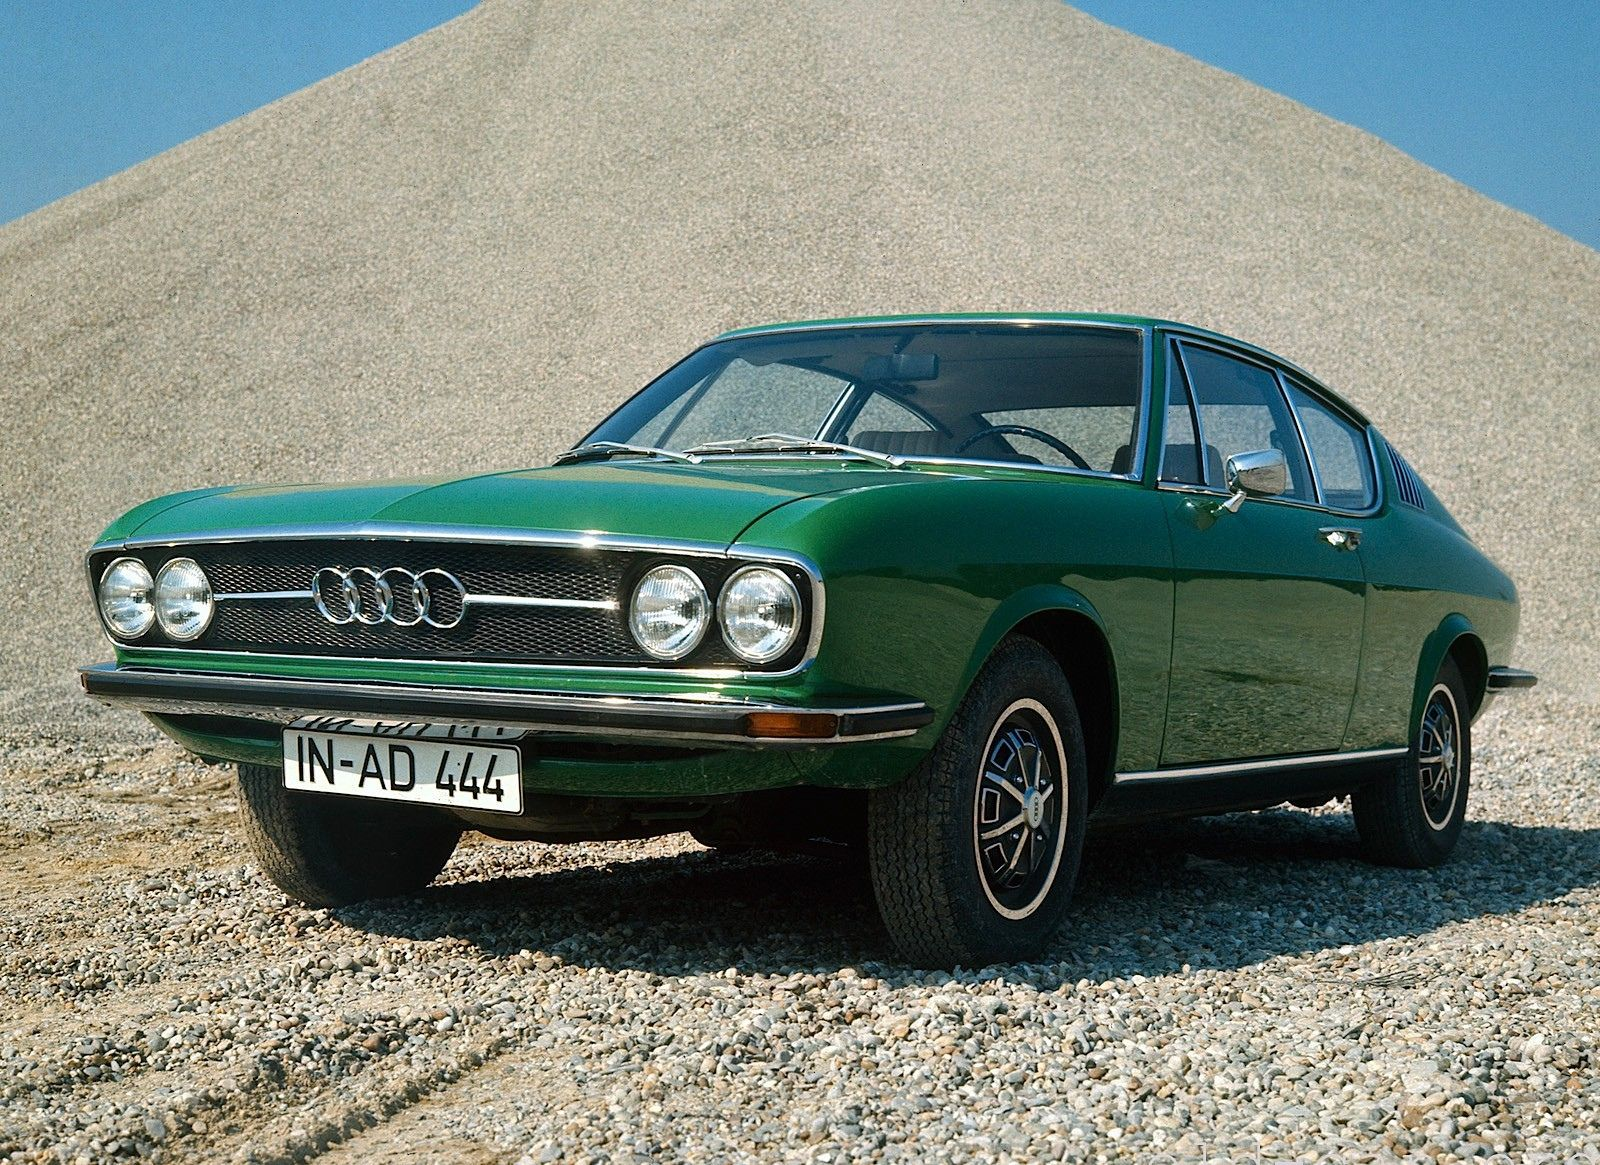 1970 Audi 100 Coupe S C1 Audi 100 Audi Audi Cars